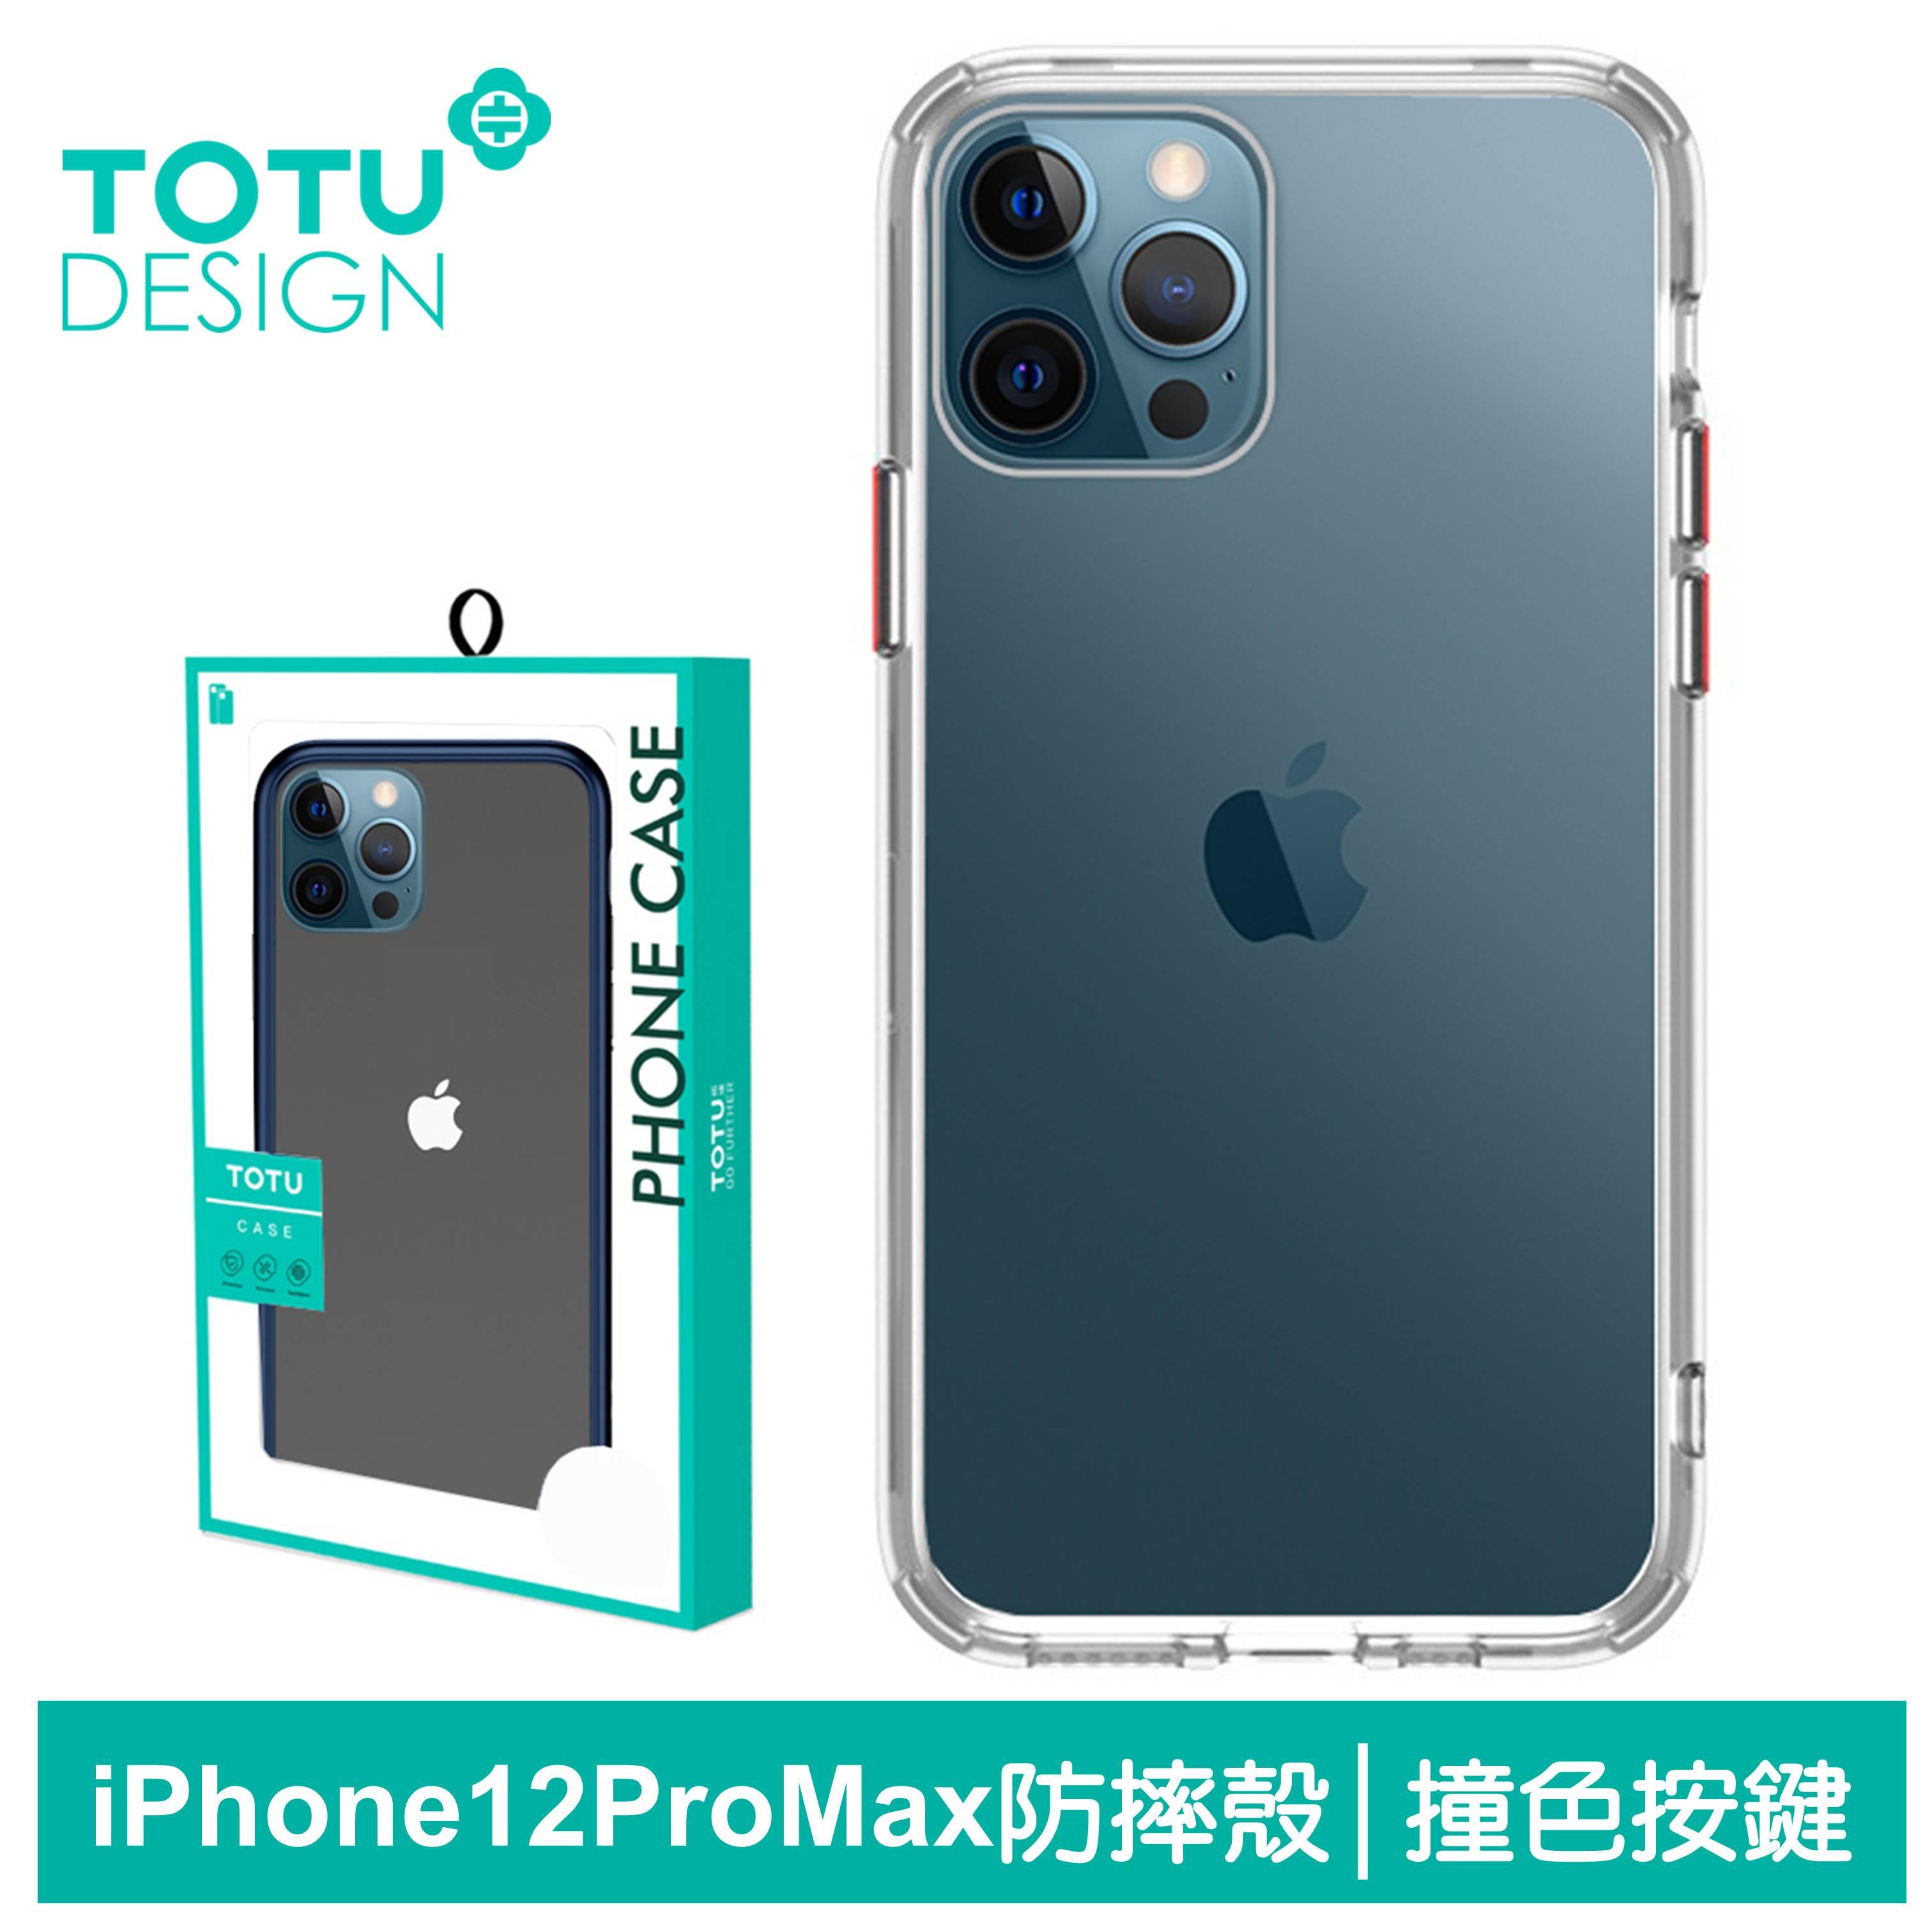 TOTU台灣官方 iPhone 12 Pro Max 手機殼 i12ProMax 保護殼 6.7吋 防摔殼 撞色按鍵 晶剛系列 透明